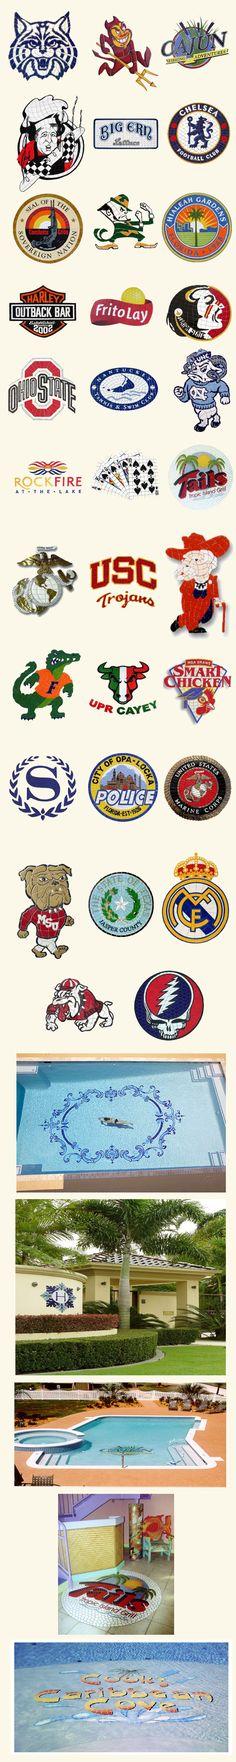 custom pool mosaics, sports logos